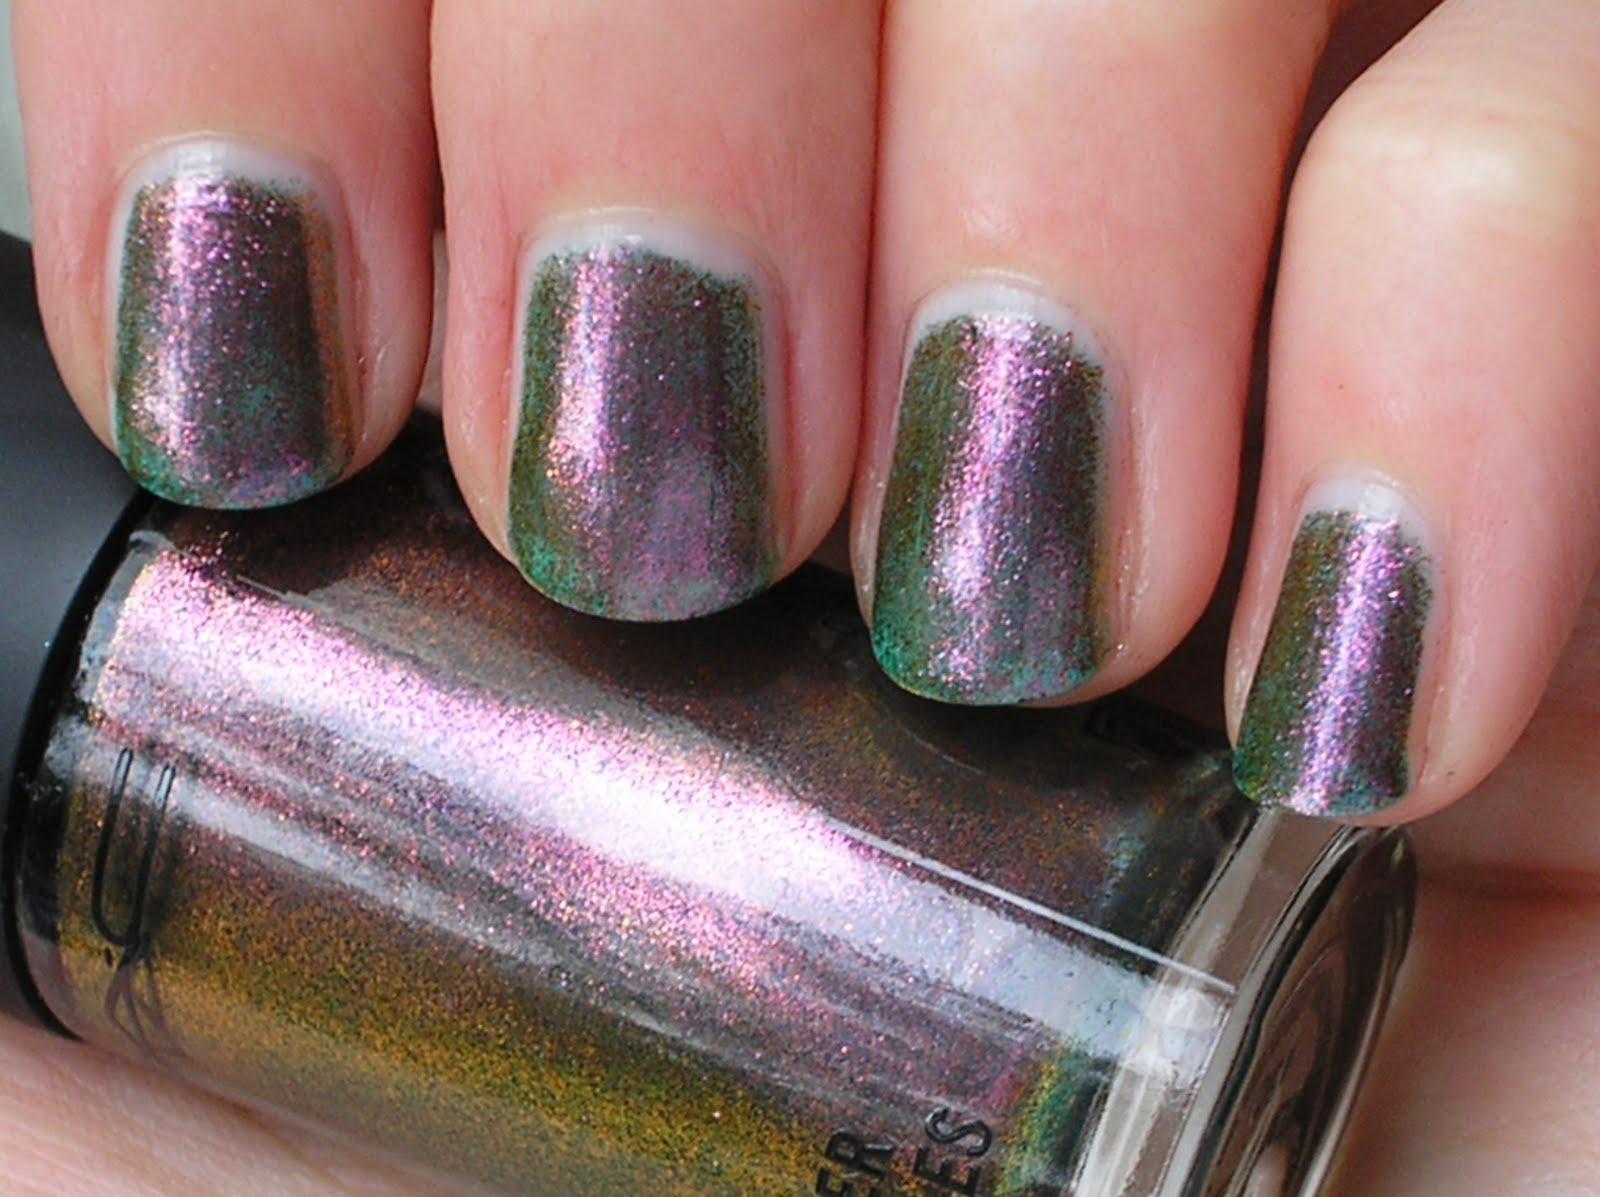 Never Enough Nails: October 2010